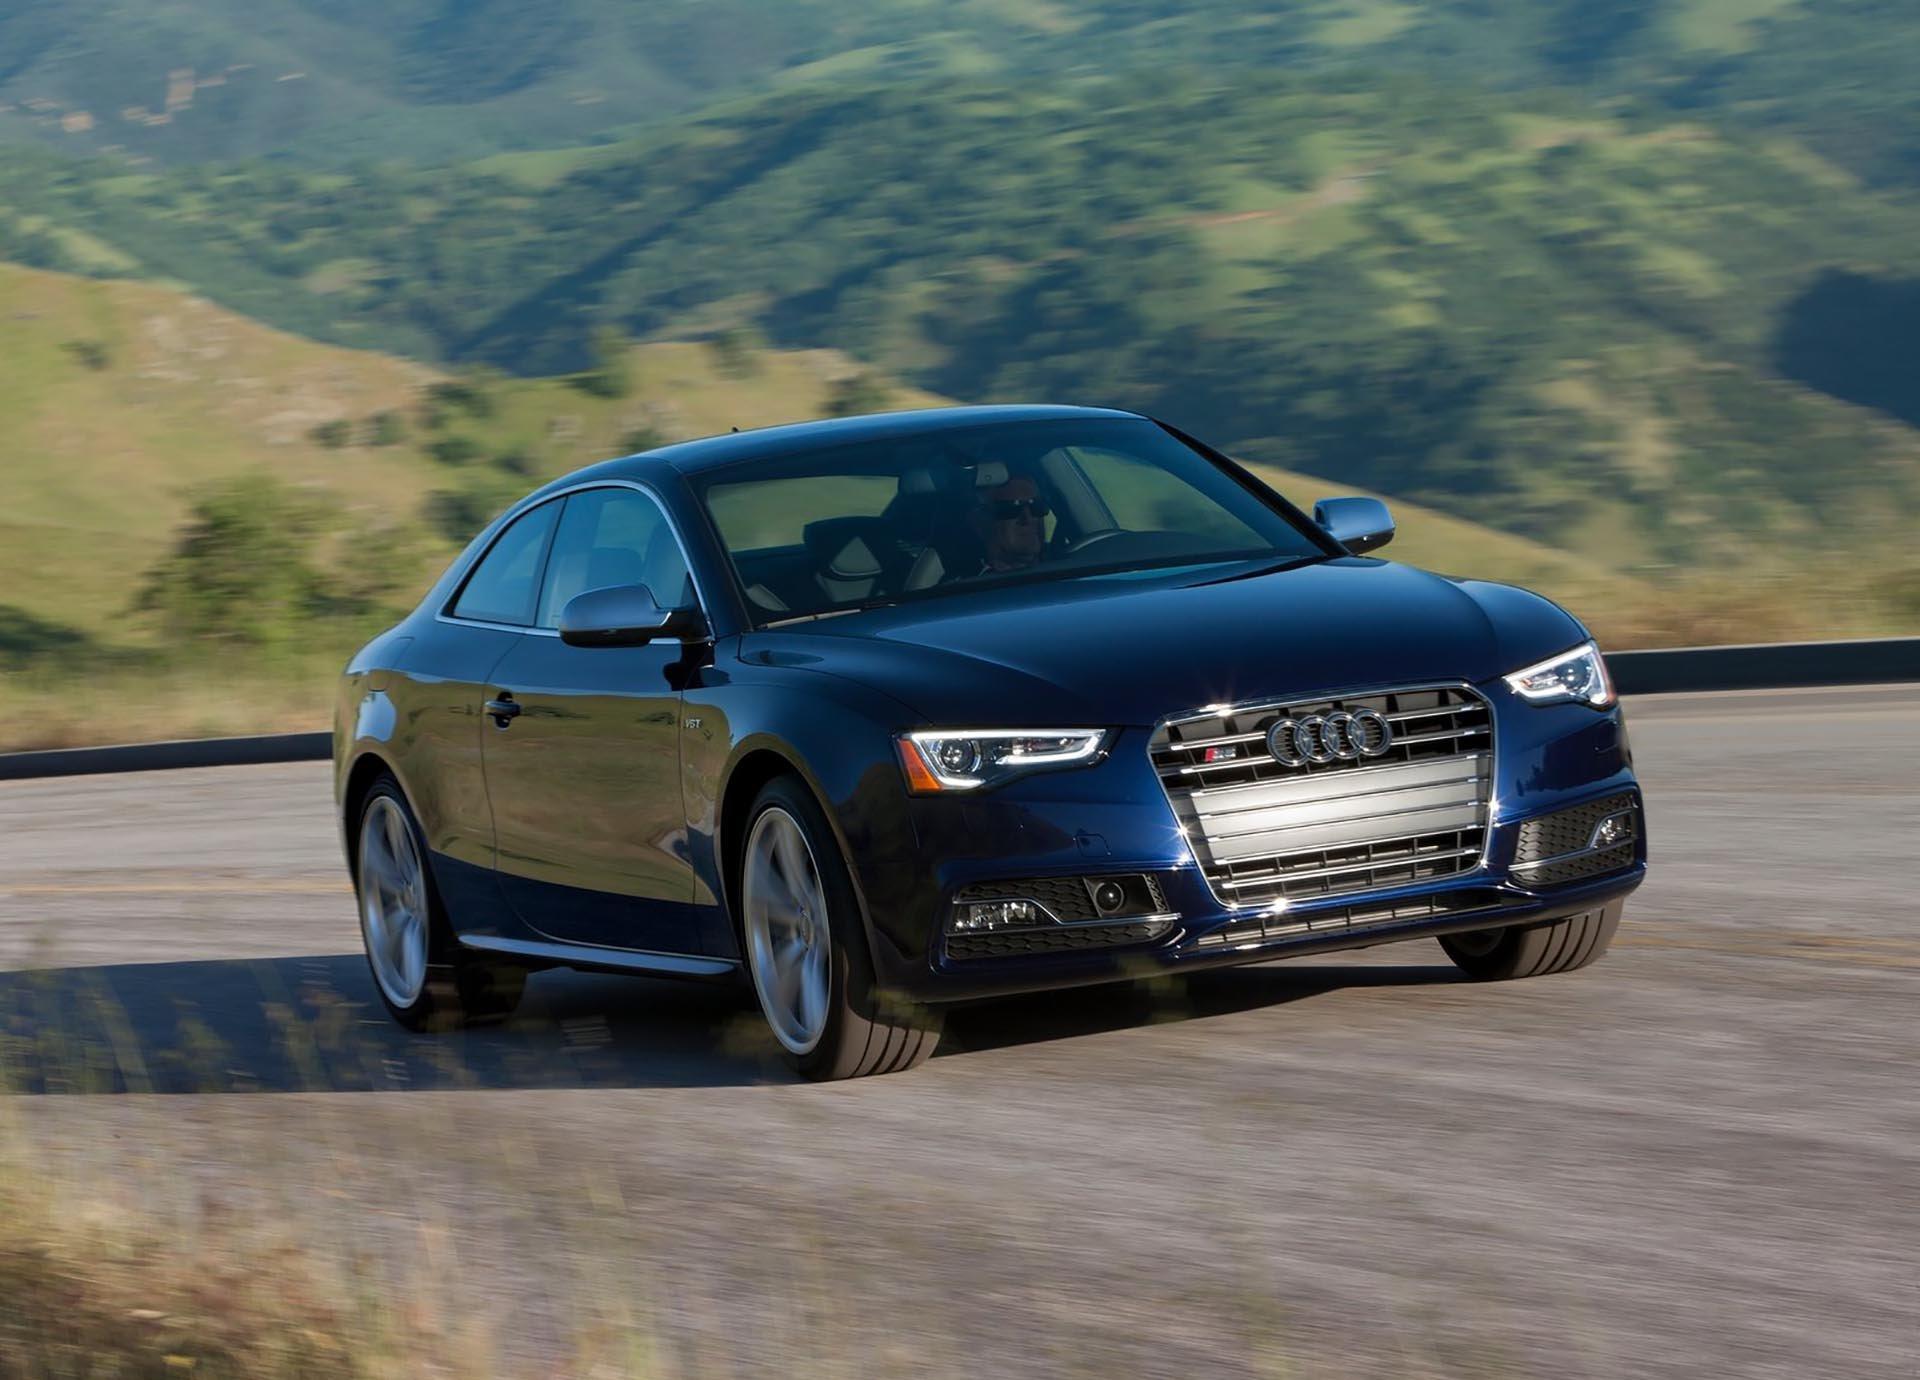 08_Audi S5 3.0t coupe front corner